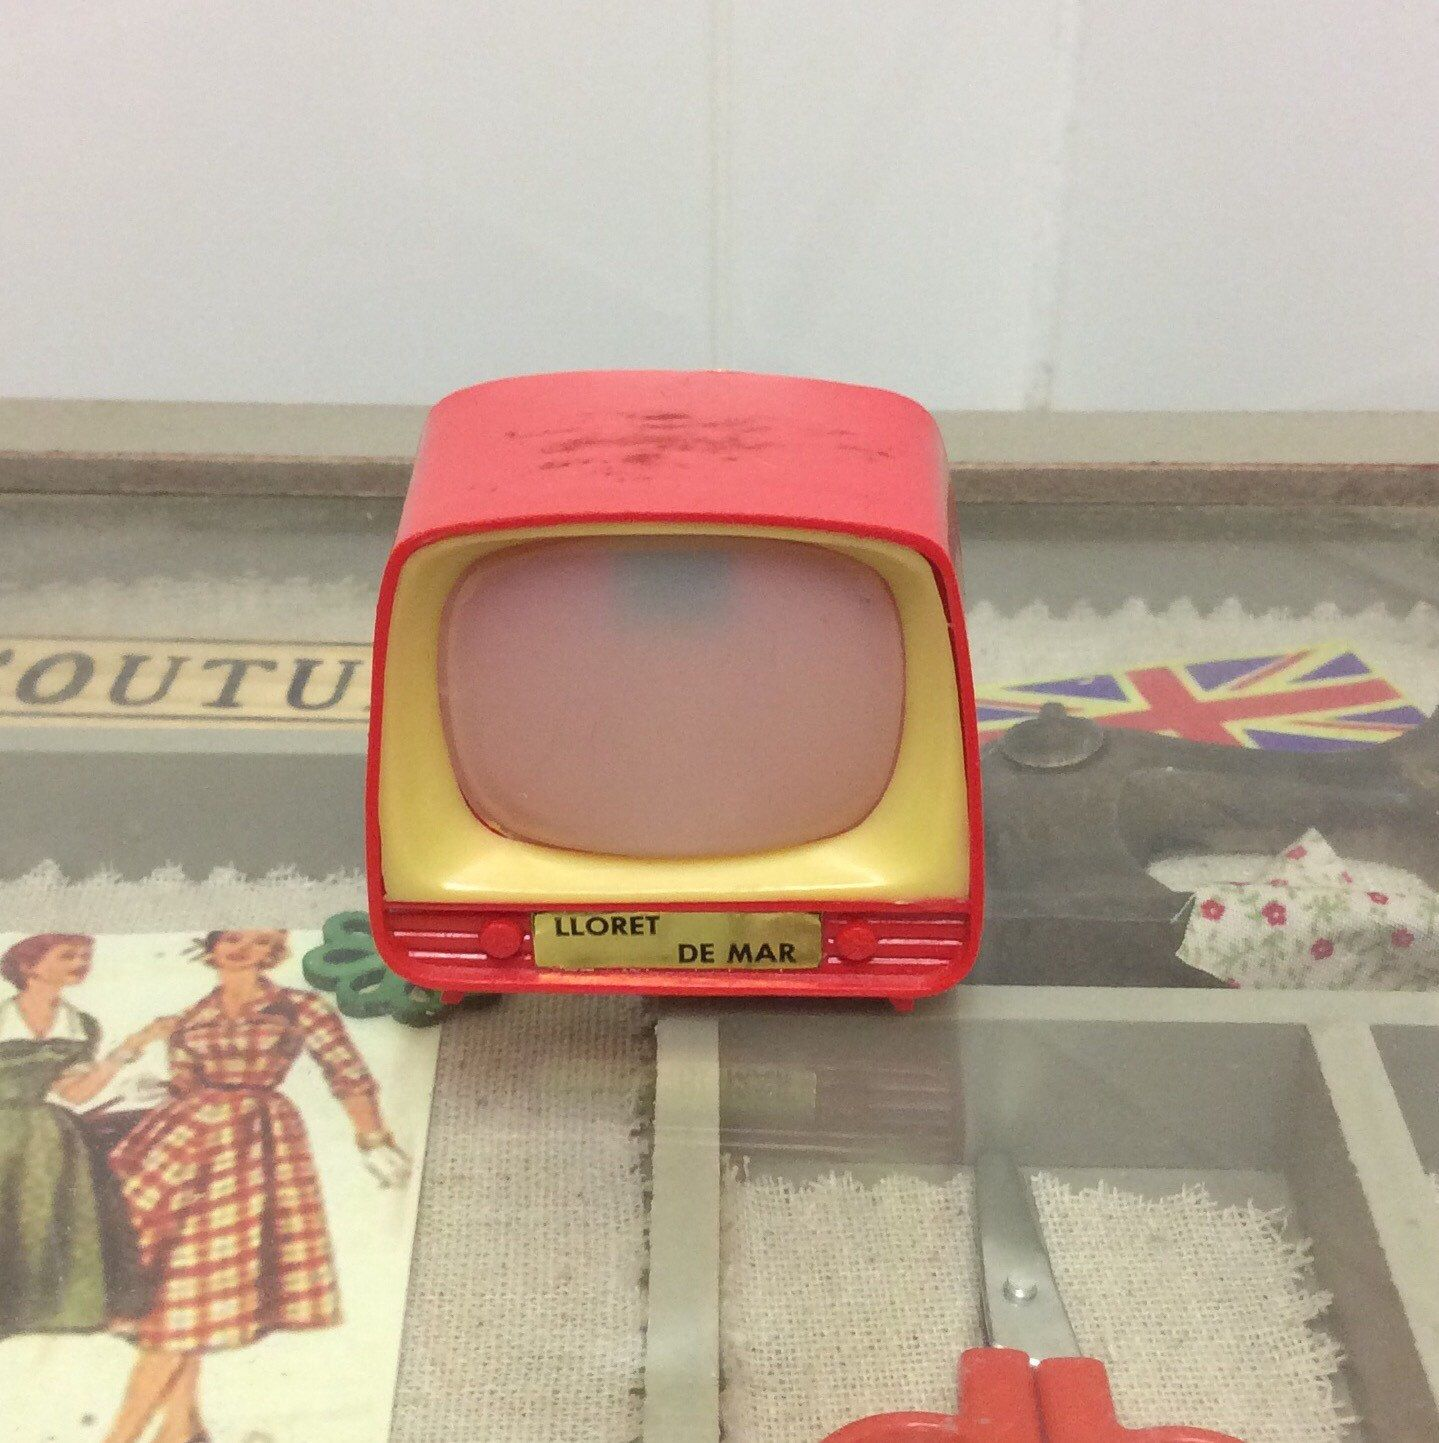 Vintage 1960s Dolls House Television With Viewfinder Photographs  # Table Television En Bois De Sapin